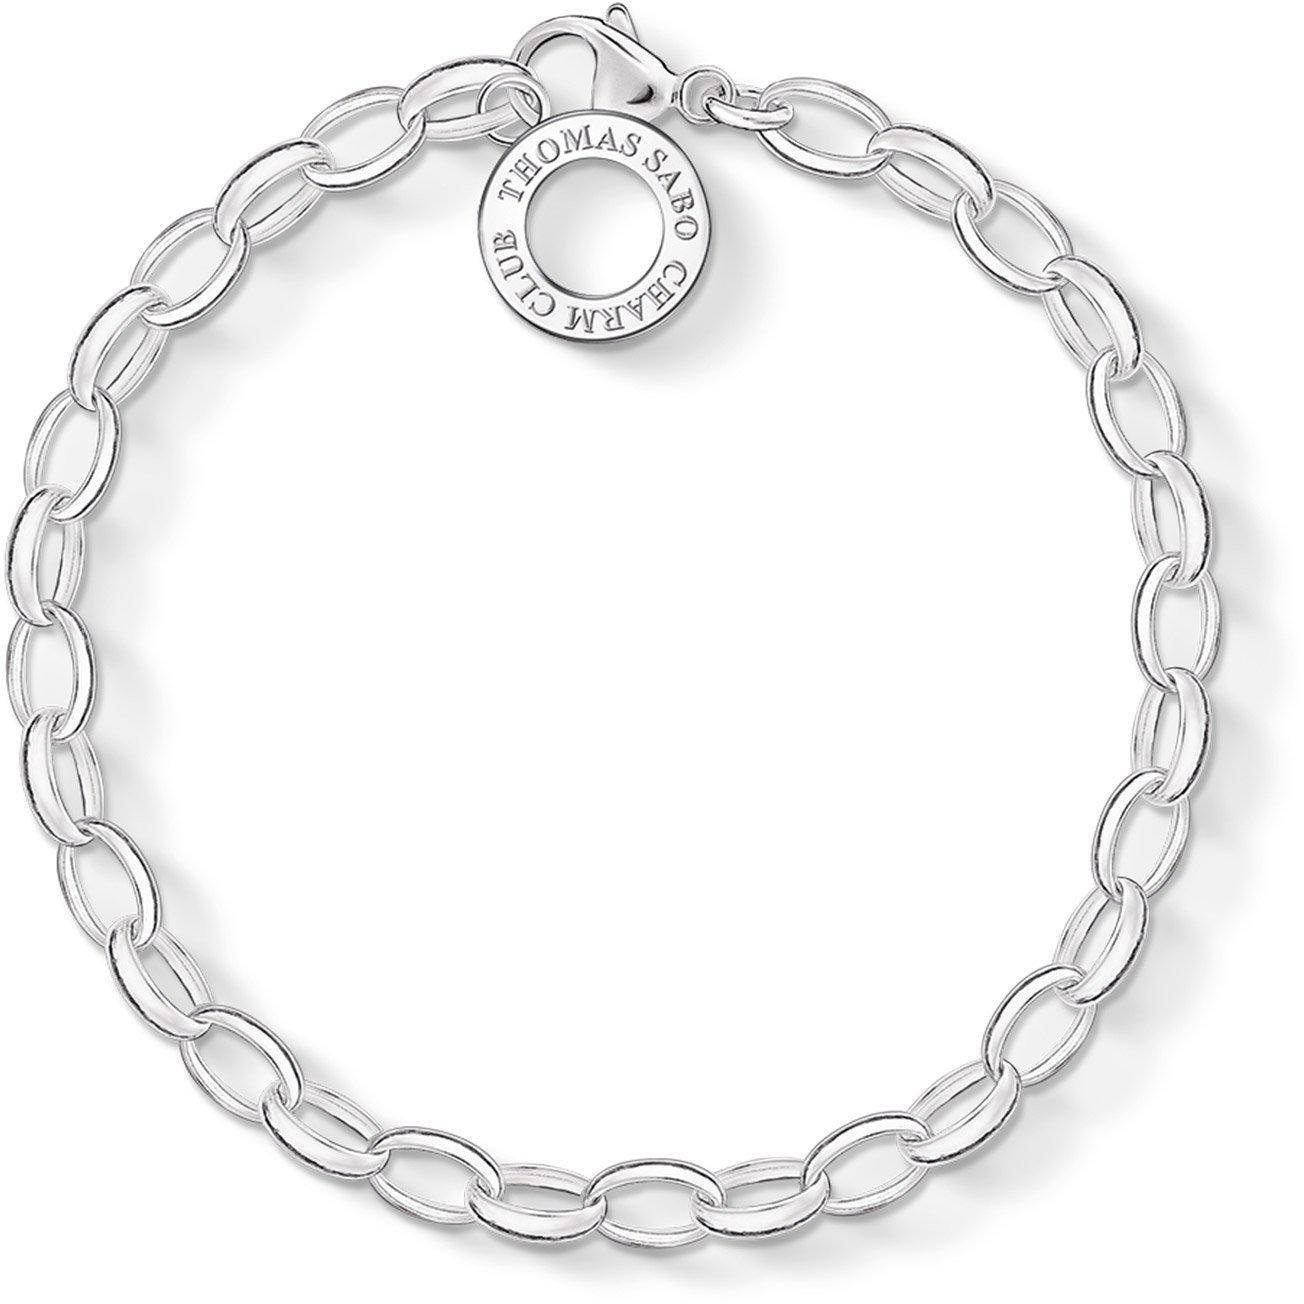 Thomas Sabo X0031-001-12 Silberarmband für Charms